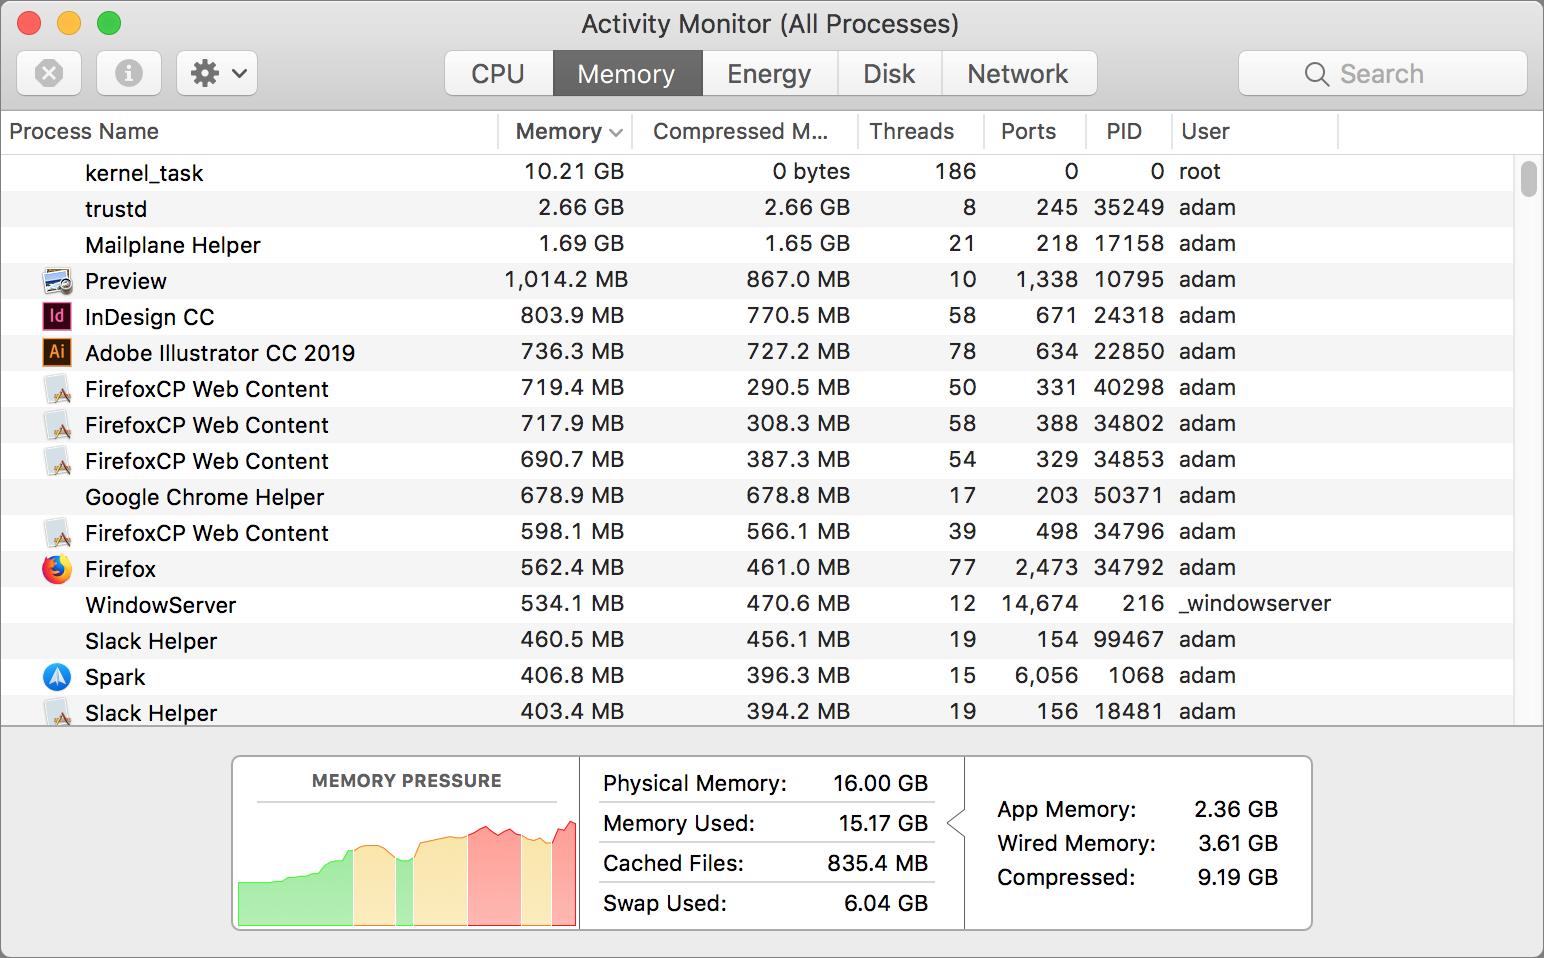 Activity-Monitor-Memory-Pressure.png